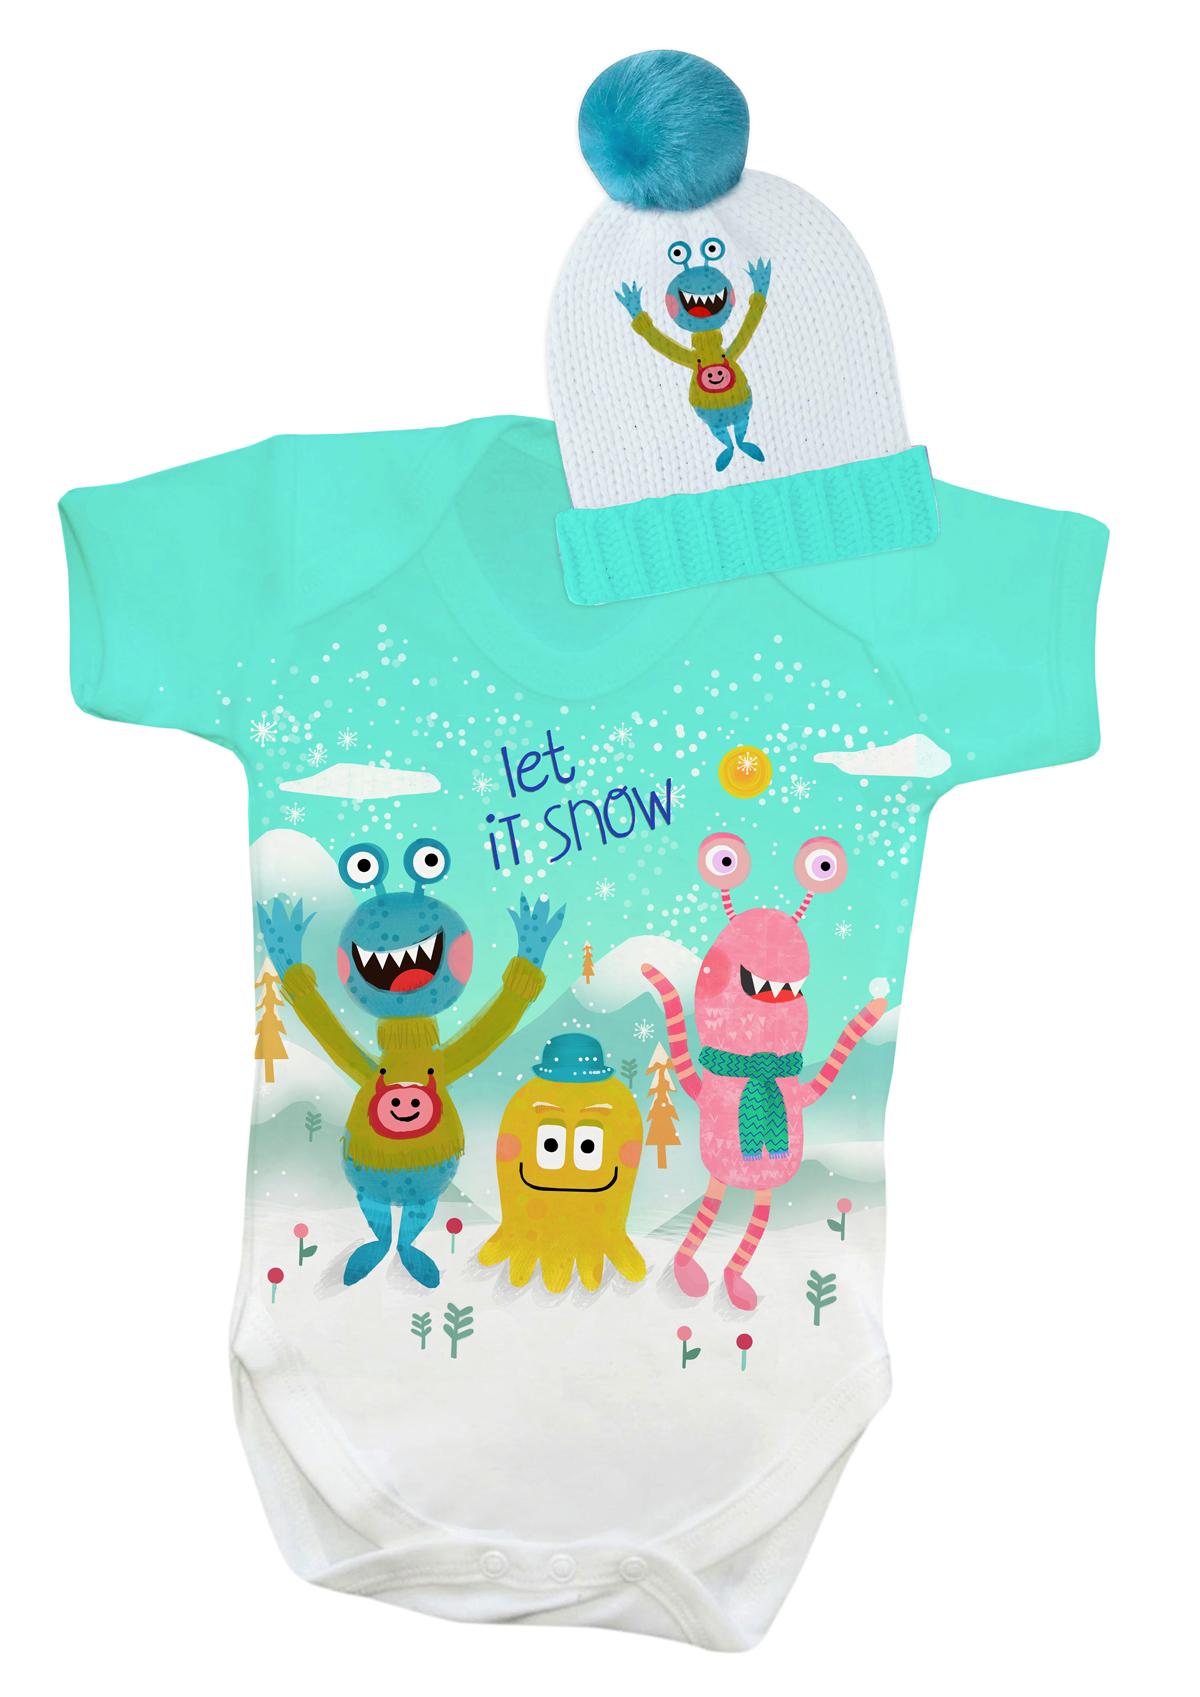 cute-monster-character-illustration-emmajayne-designs